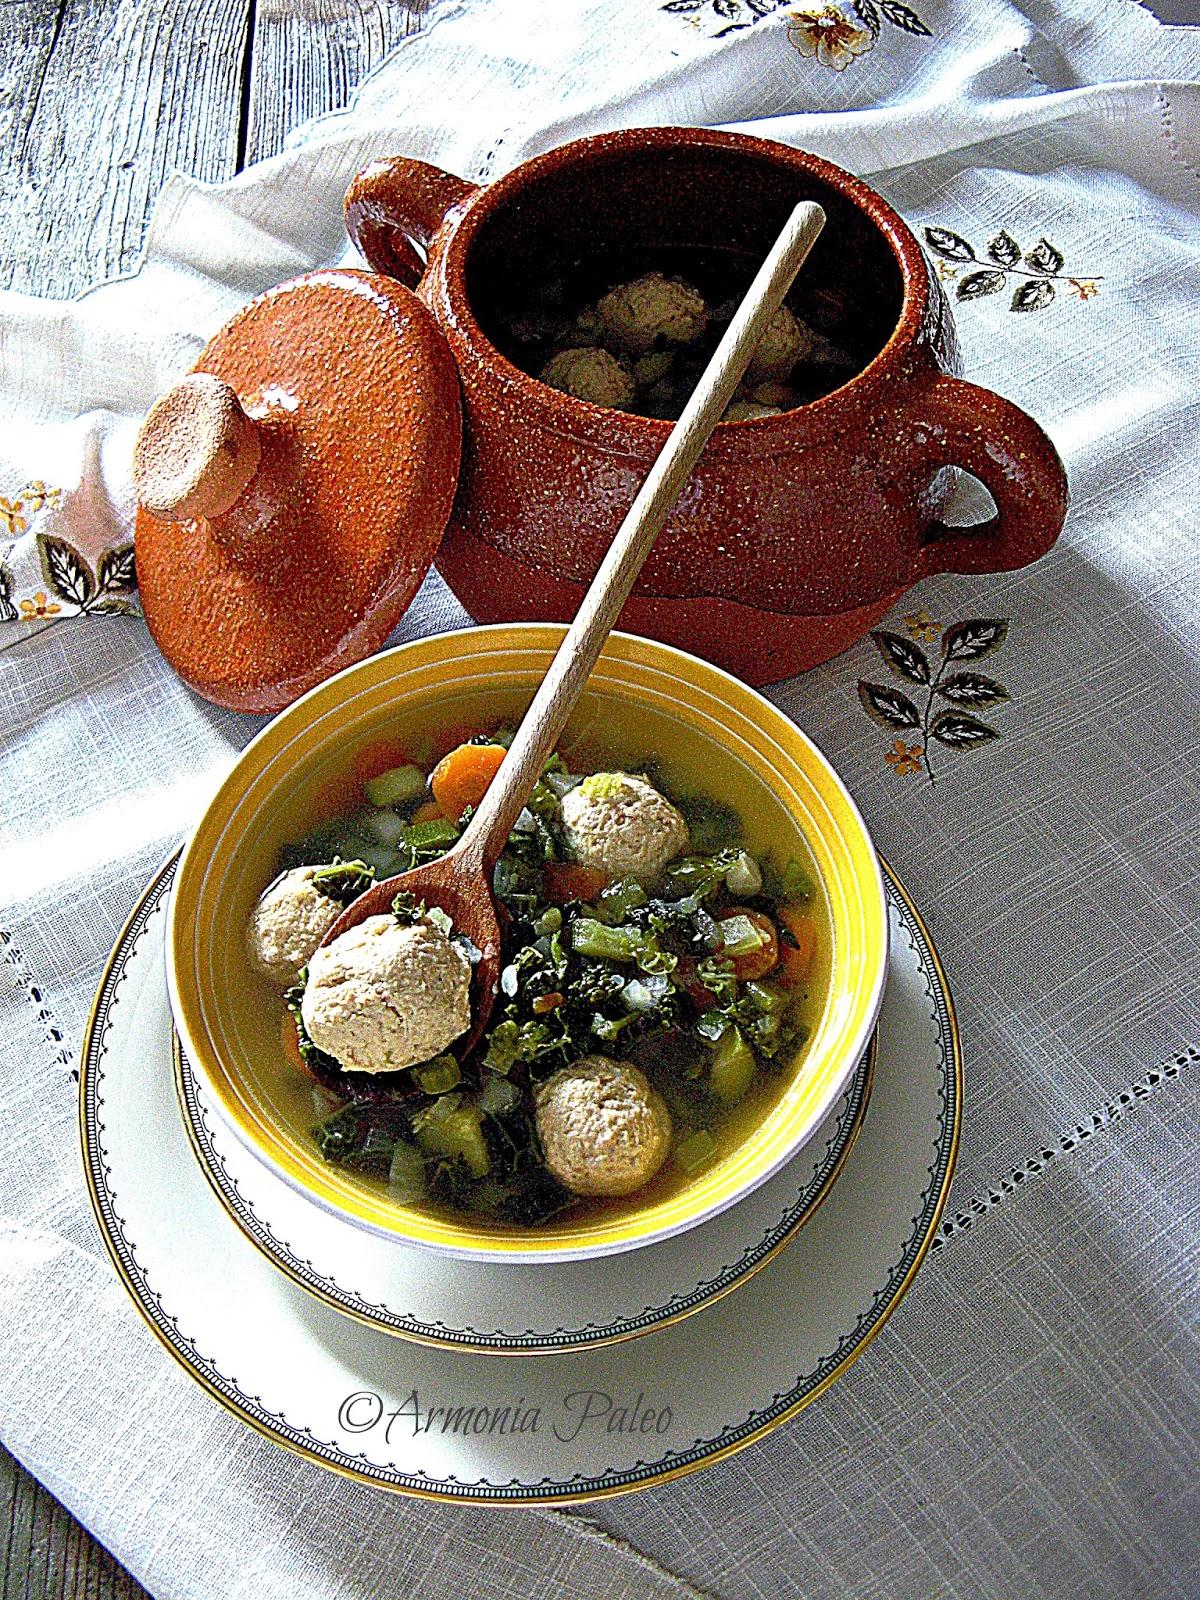 Dārzeņu Zupa ar Vistas Frikadelēm - Zuppa di Verdure con Polpette di Pollo di Armonia Paleo